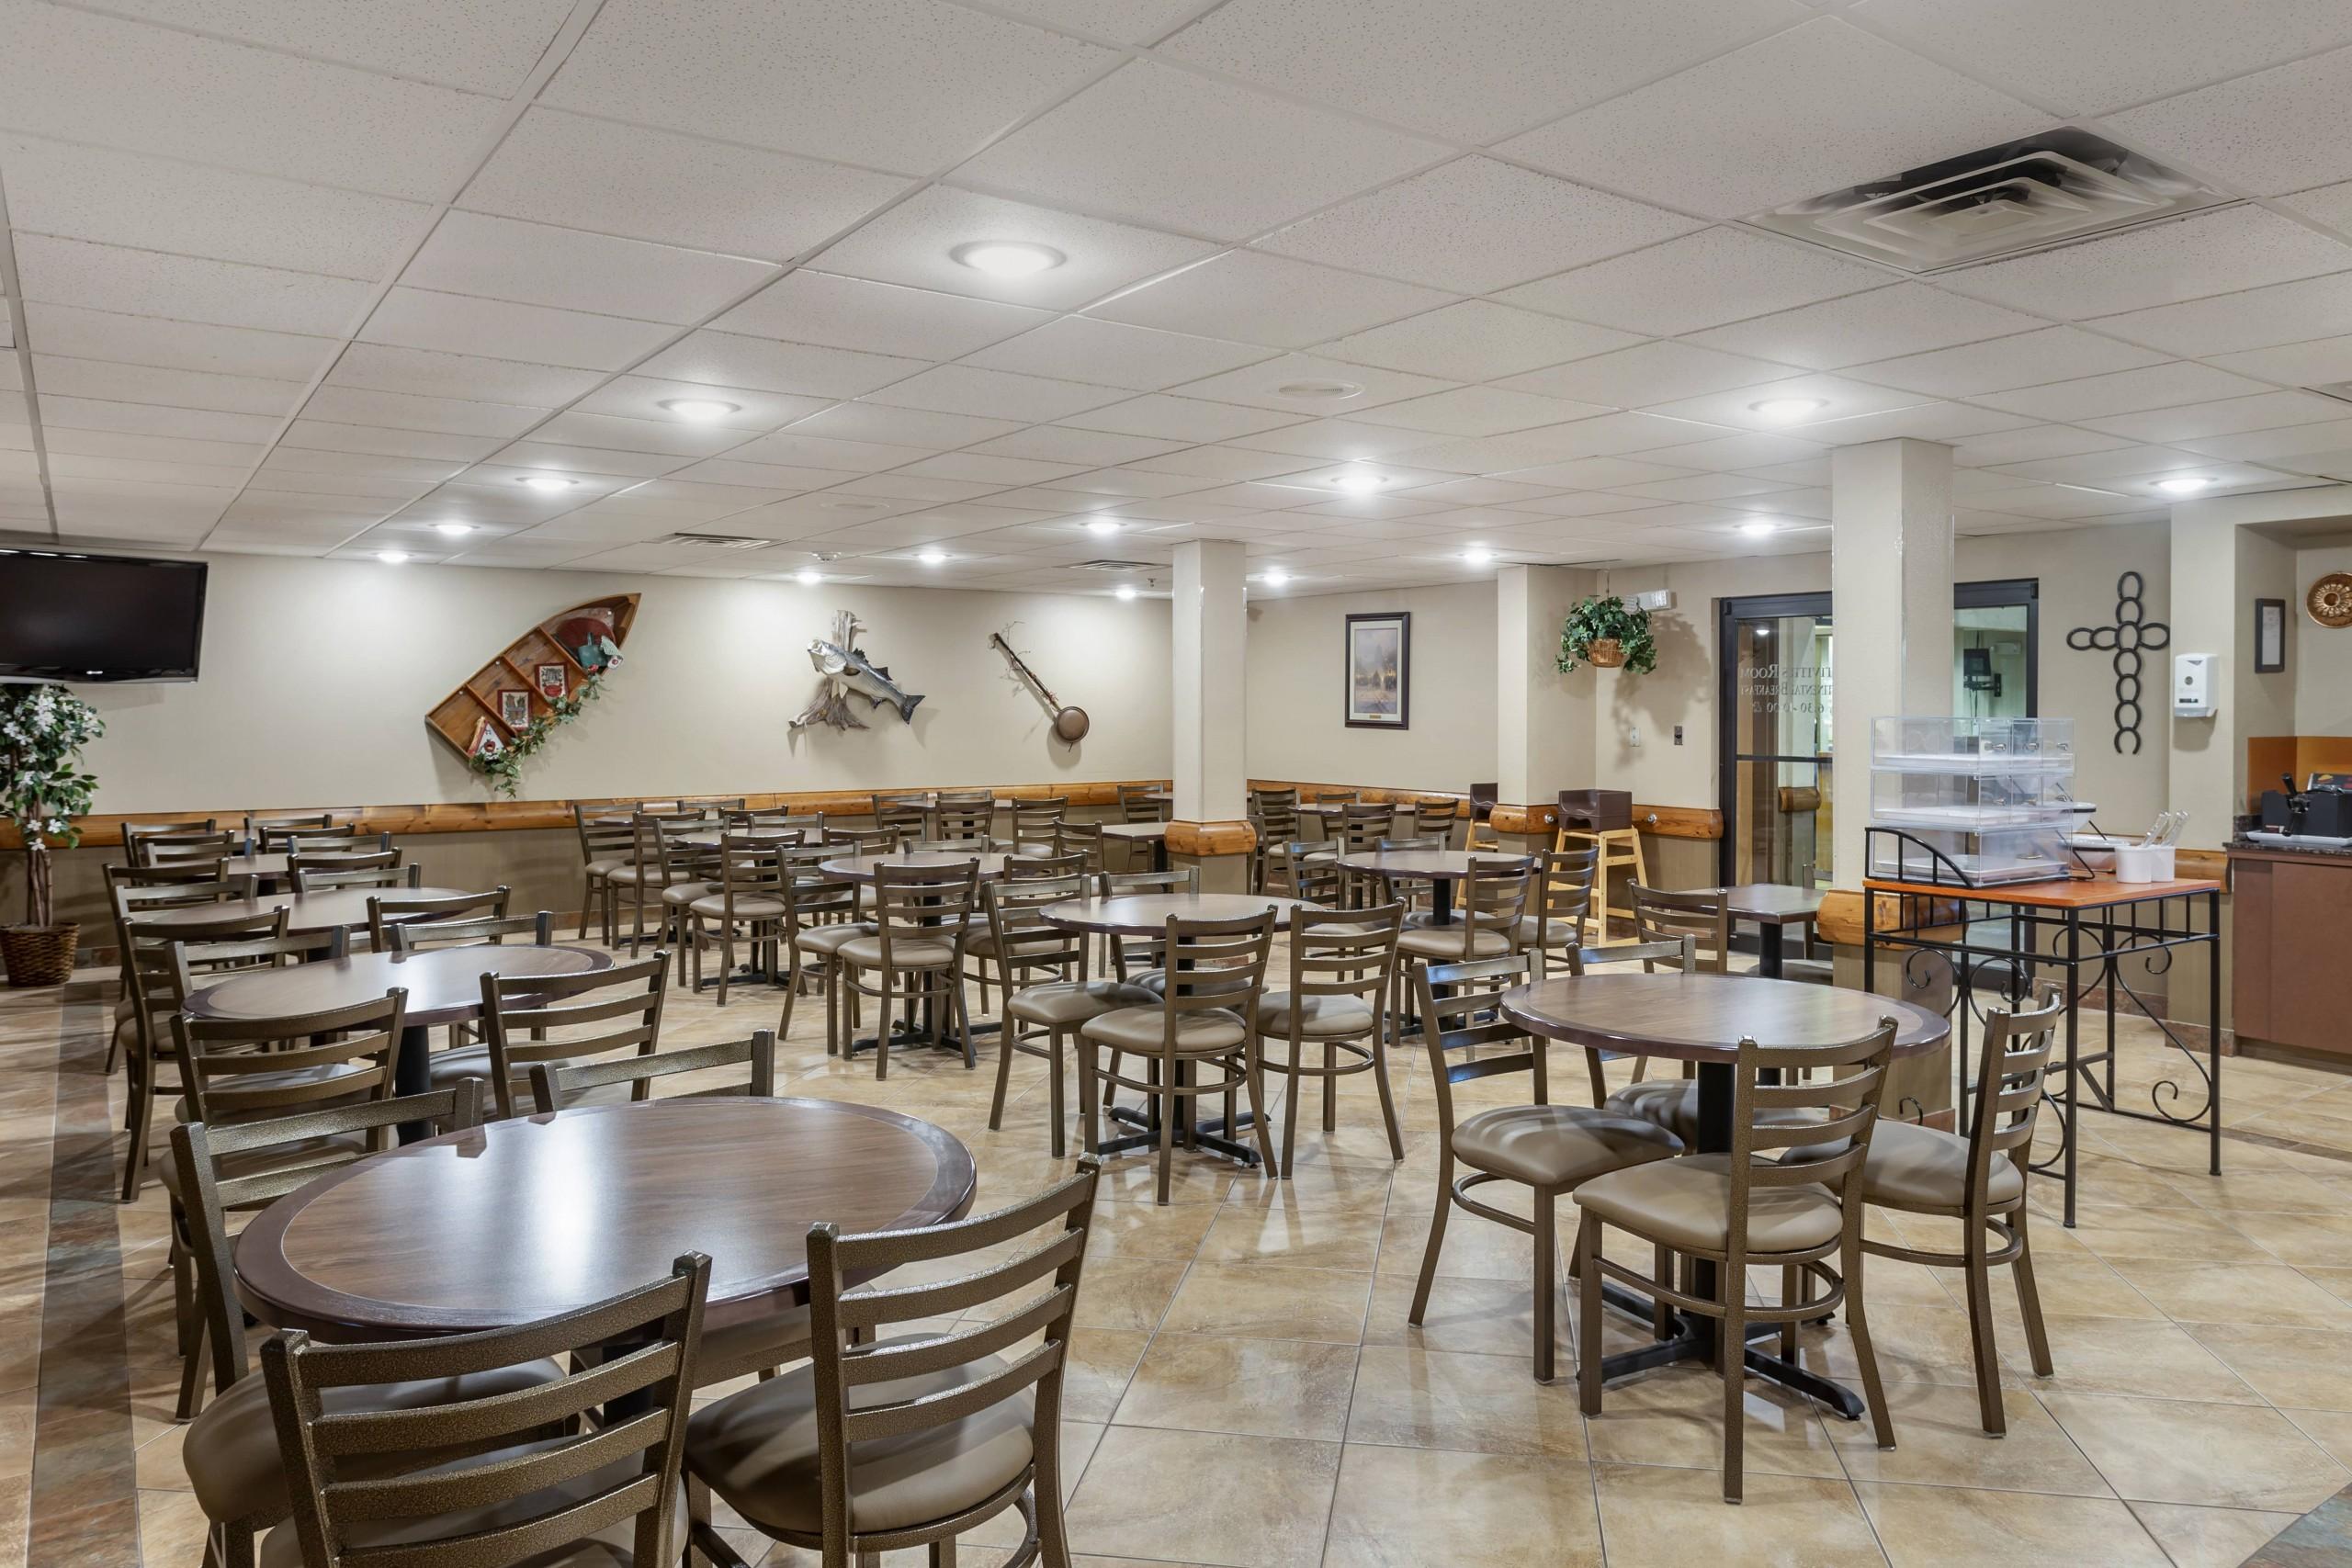 Comfort Inn & Suites Breakfast dining area